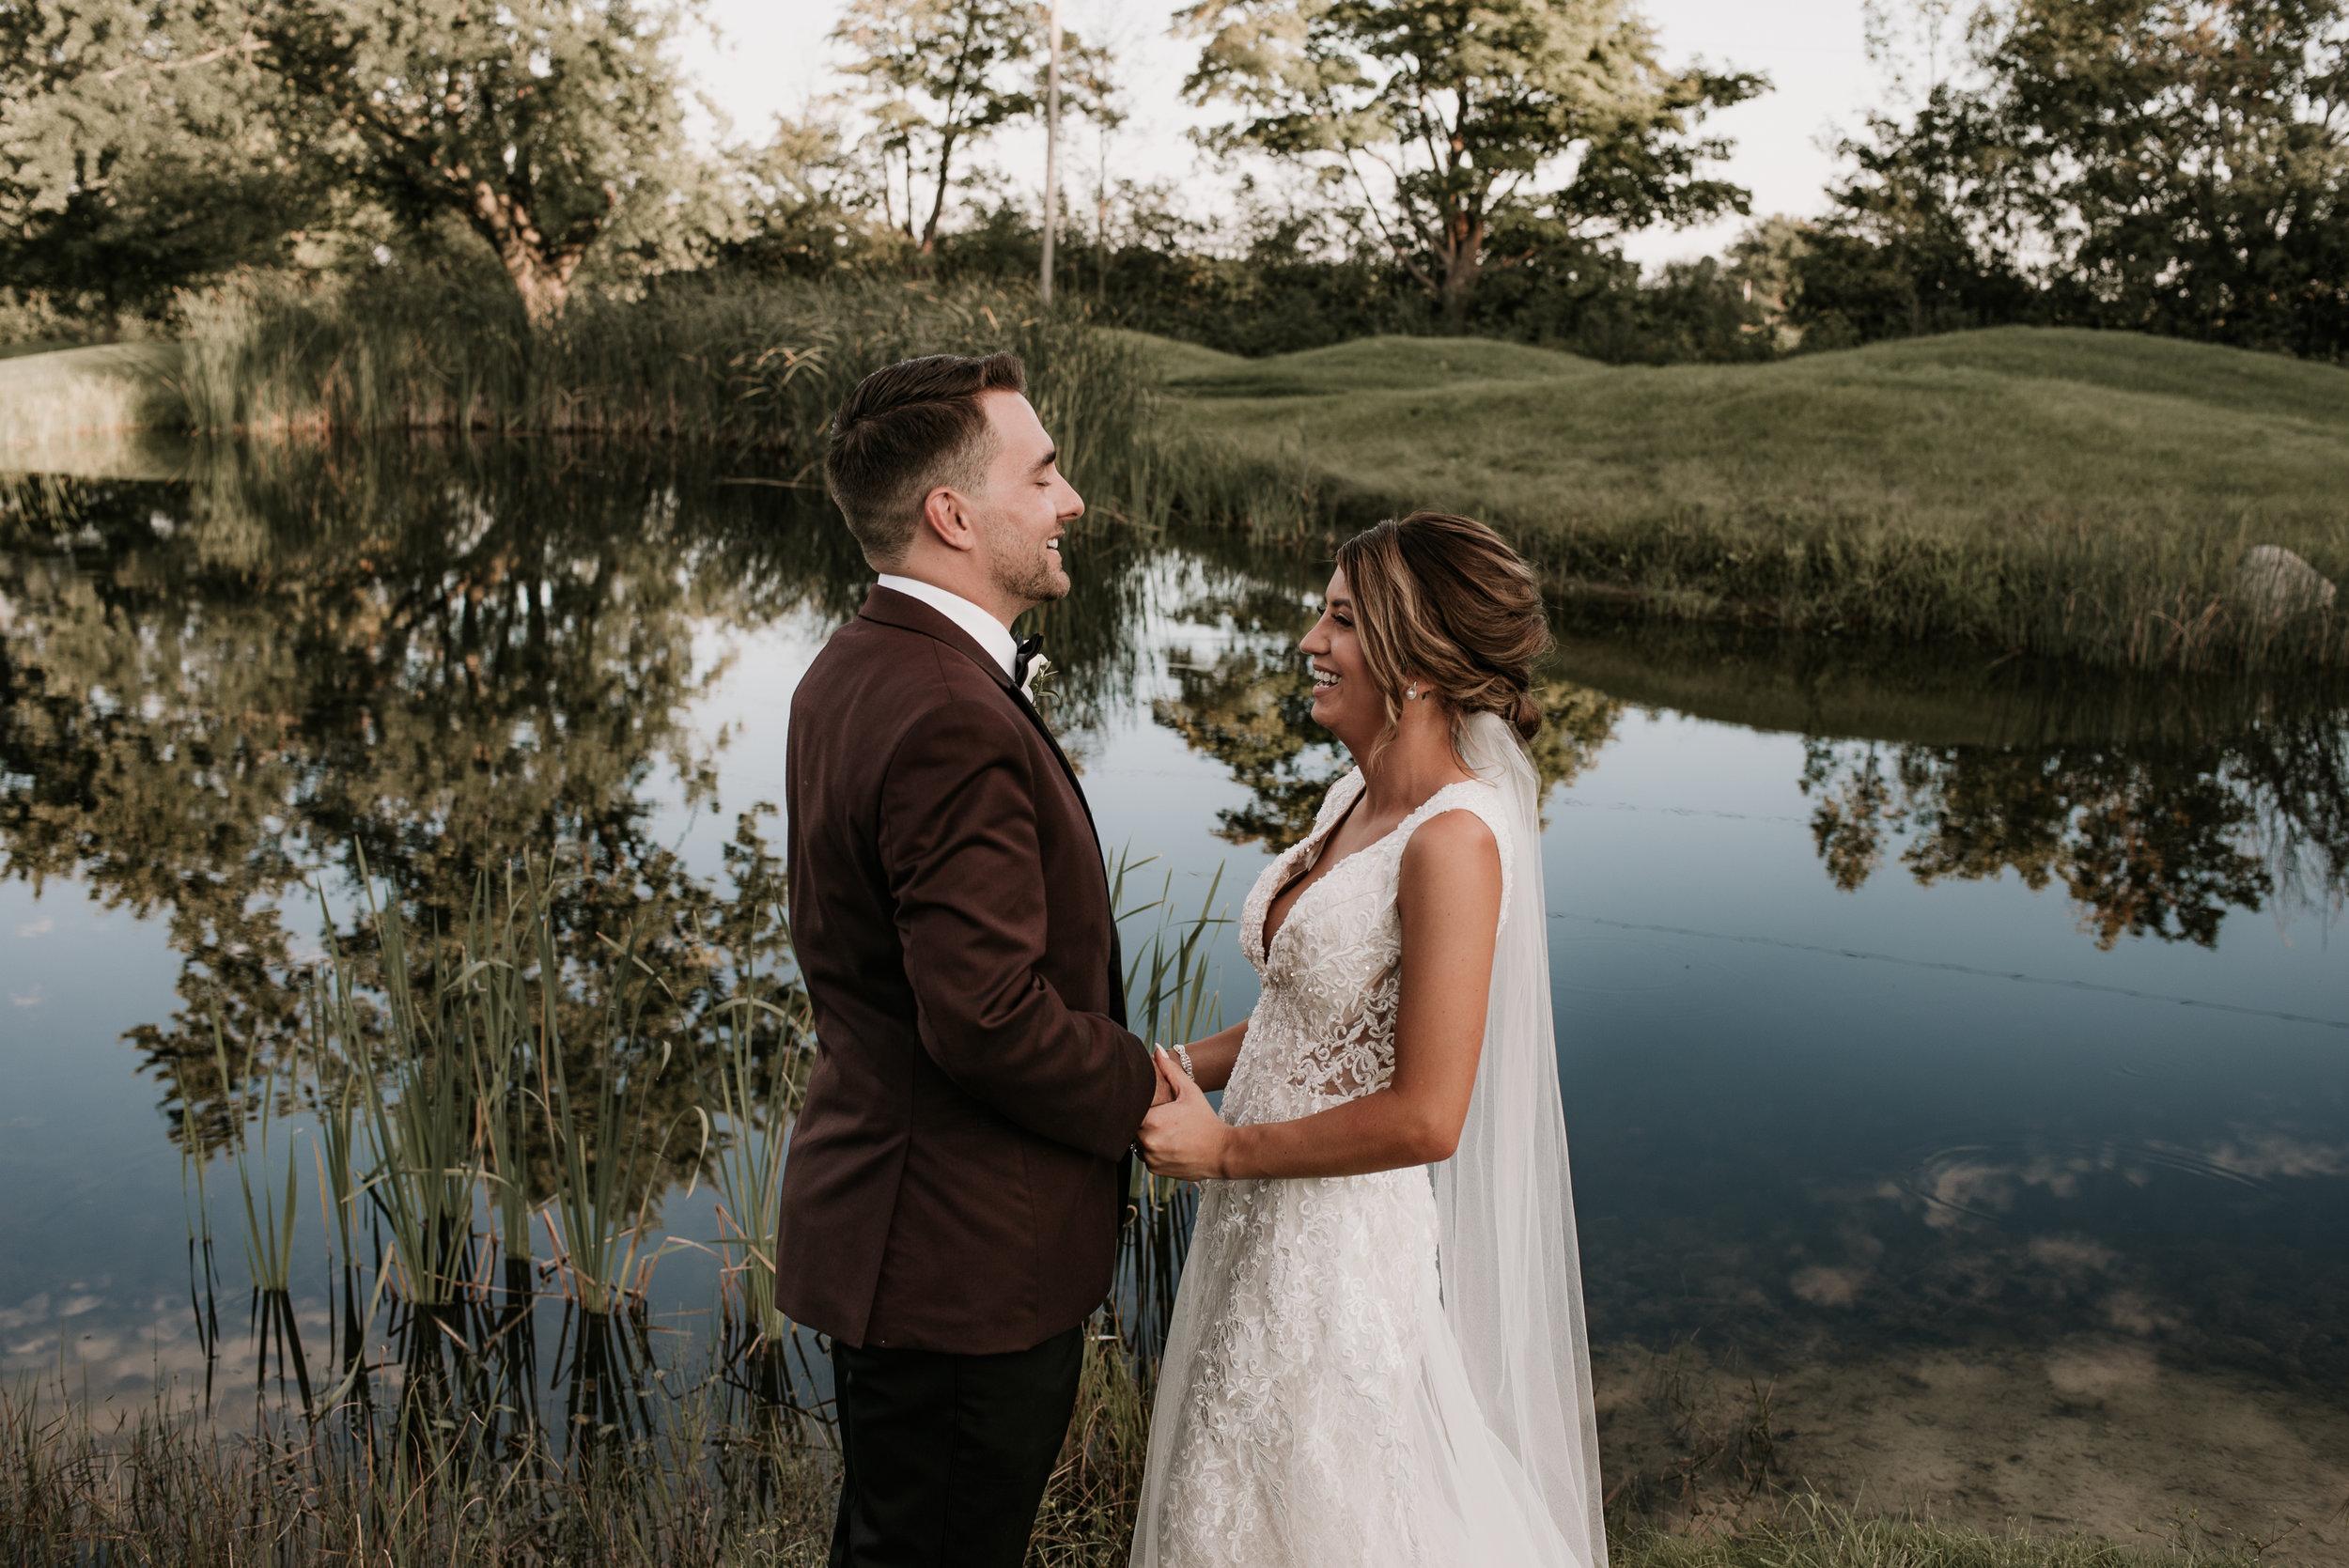 Claremont_fourseasons_Wedding-364.jpg